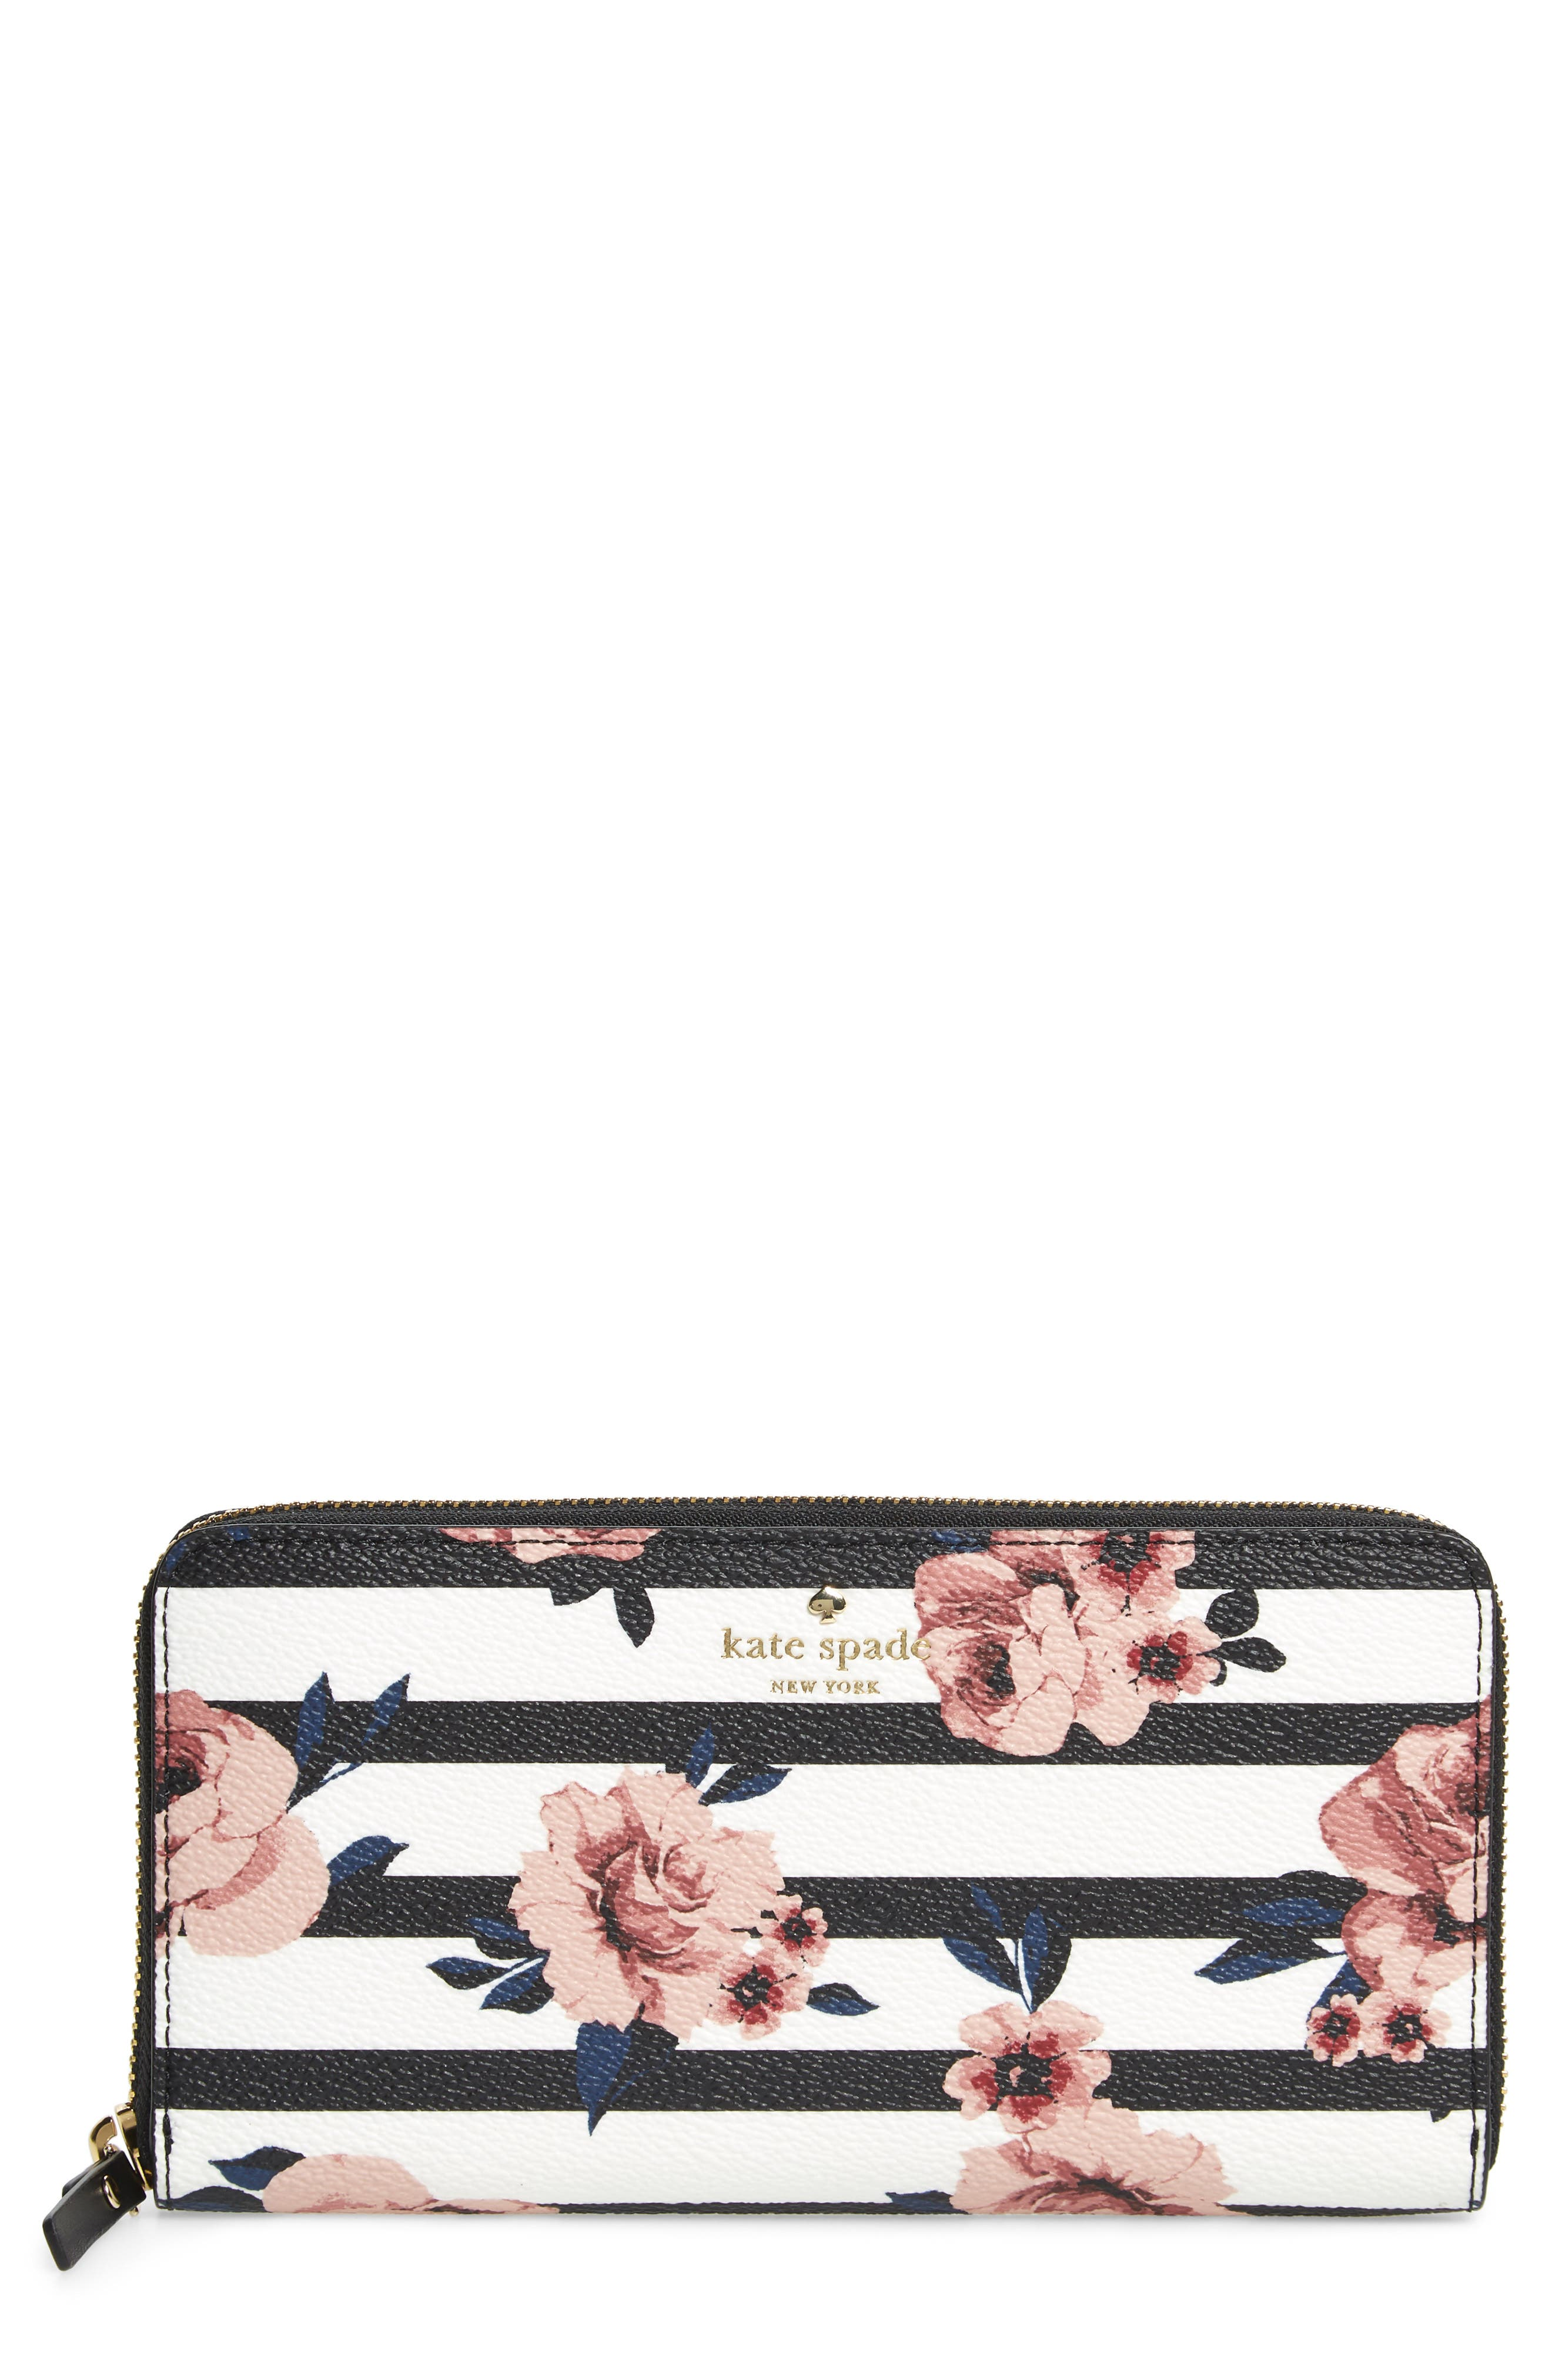 KATE SPADE NEW YORK hyde lane - rose stripe lacey zip around wallet, Main, color, 001